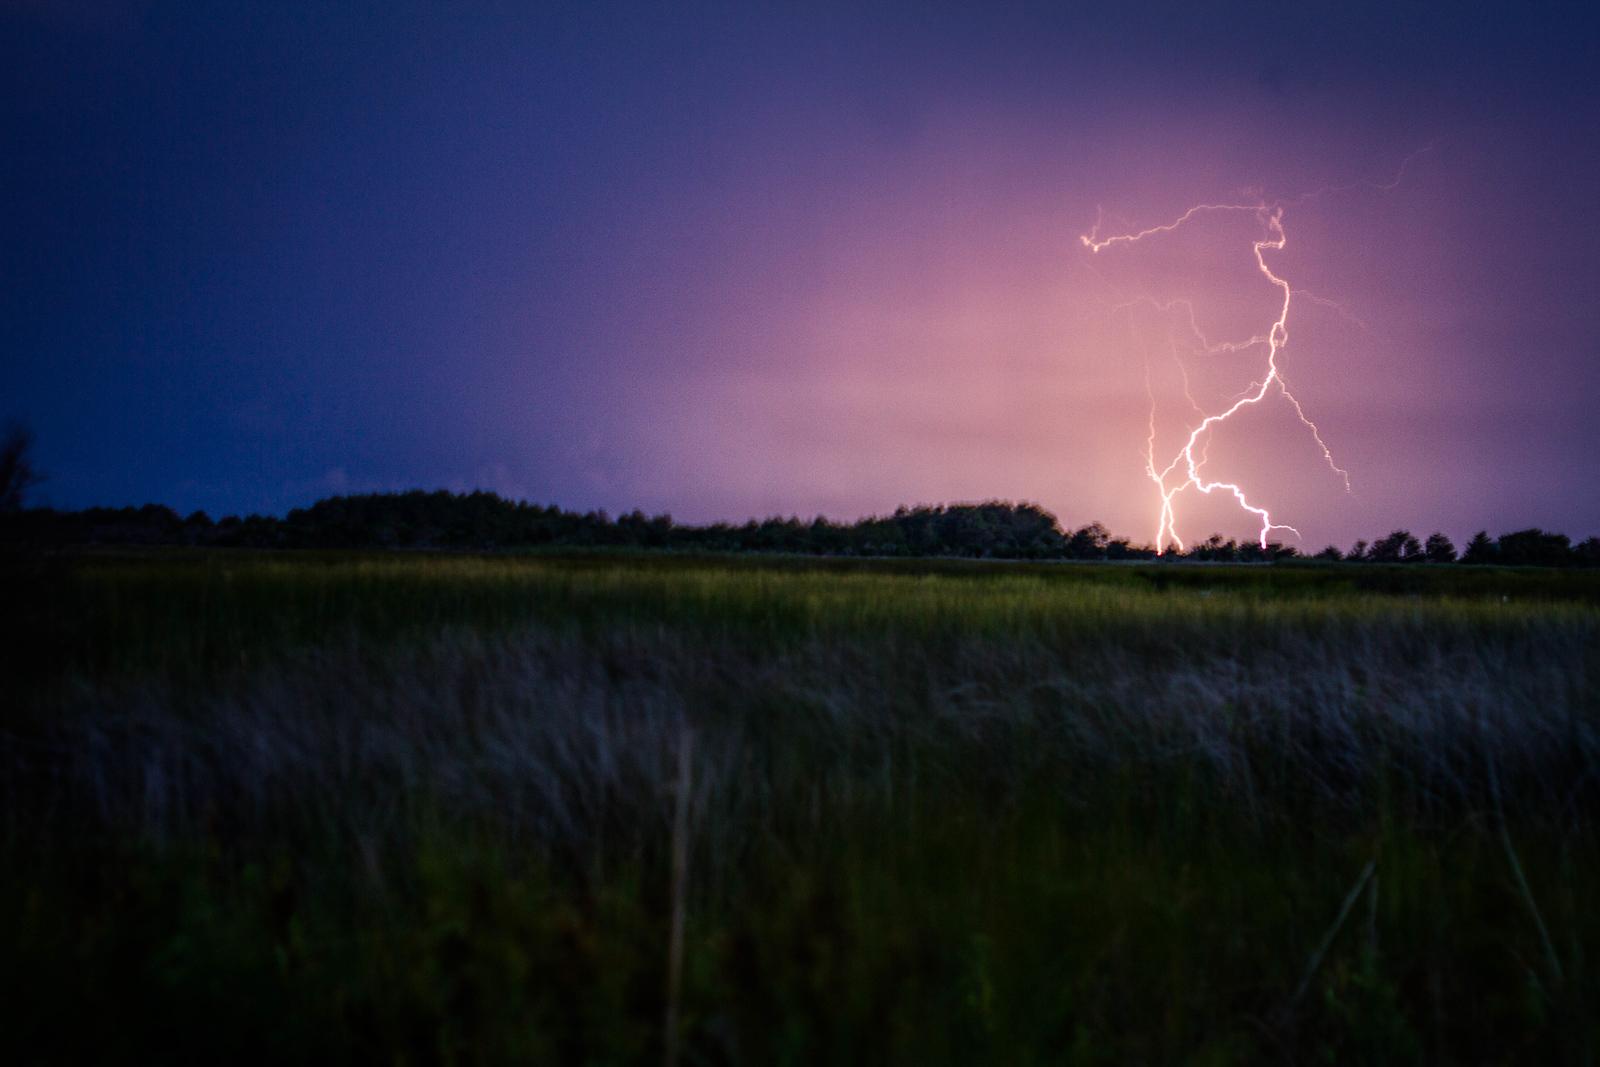 obx storm (3 of 3)